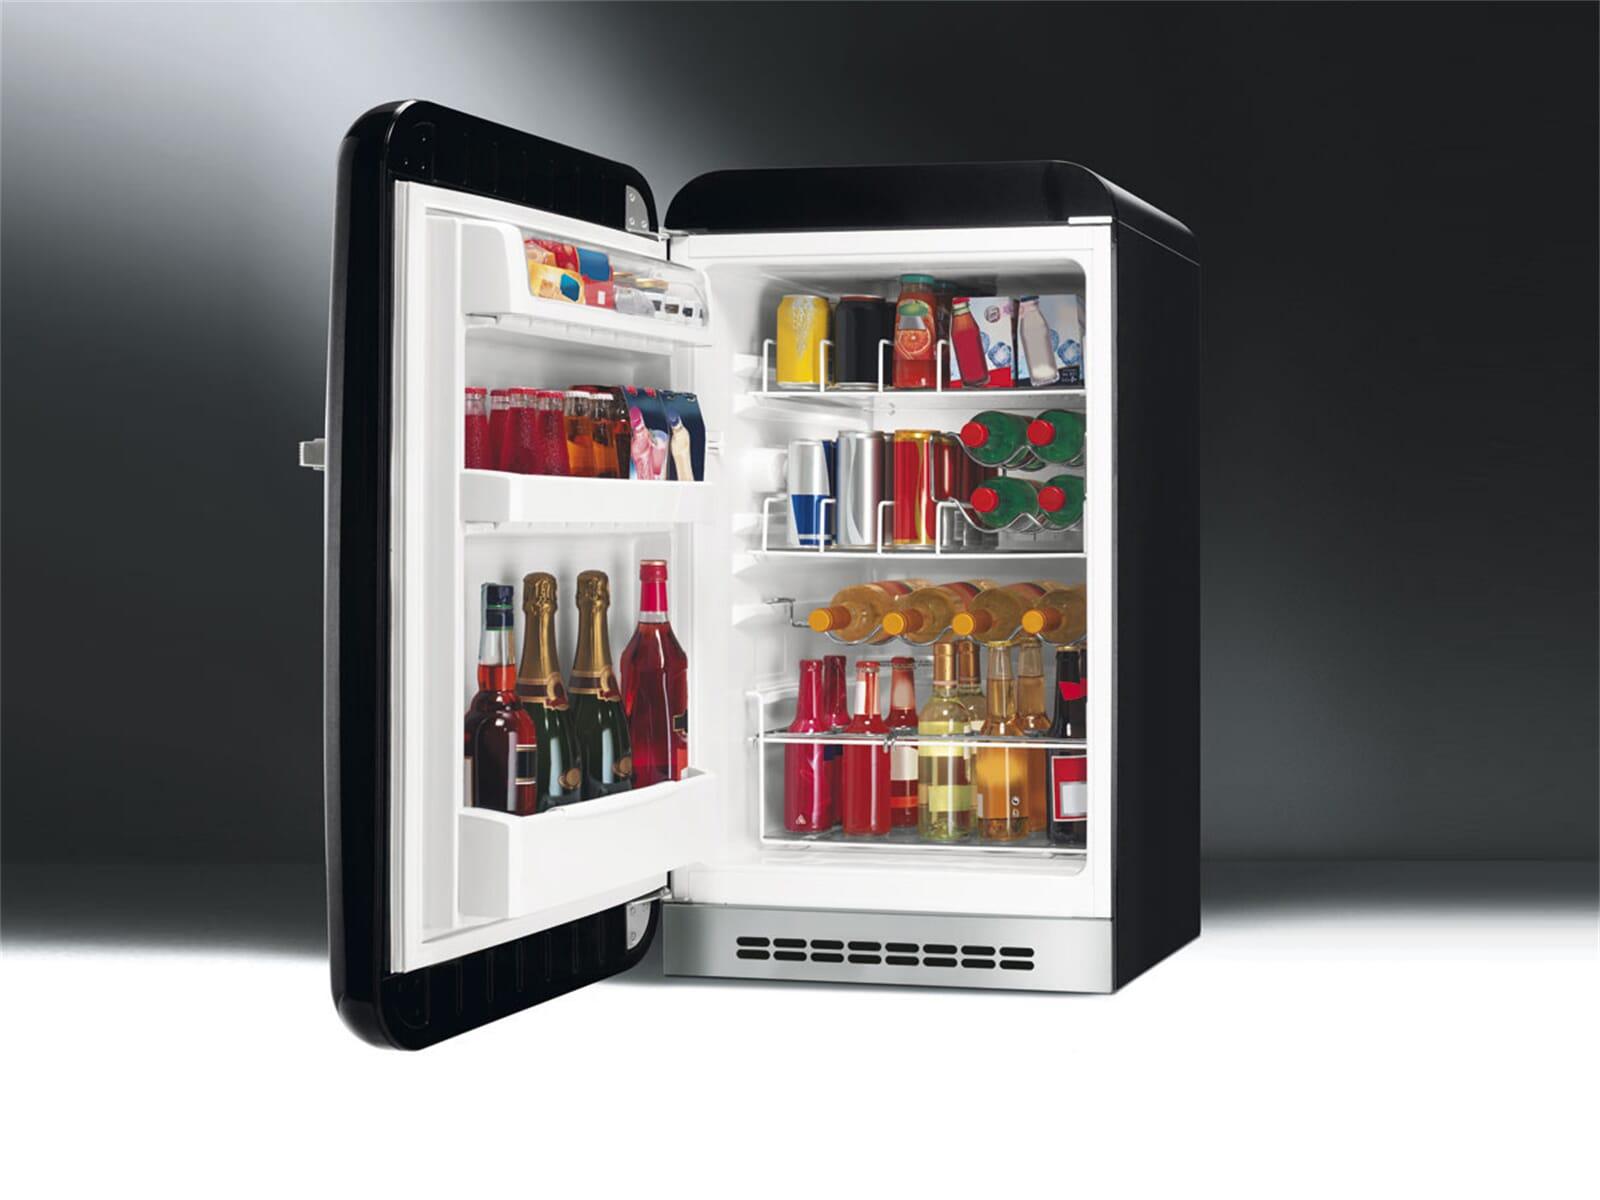 Smeg Kühlschrank Black Velvet : Smeg kühlschrank schwarz smeg fab rne stand gefrierkombination